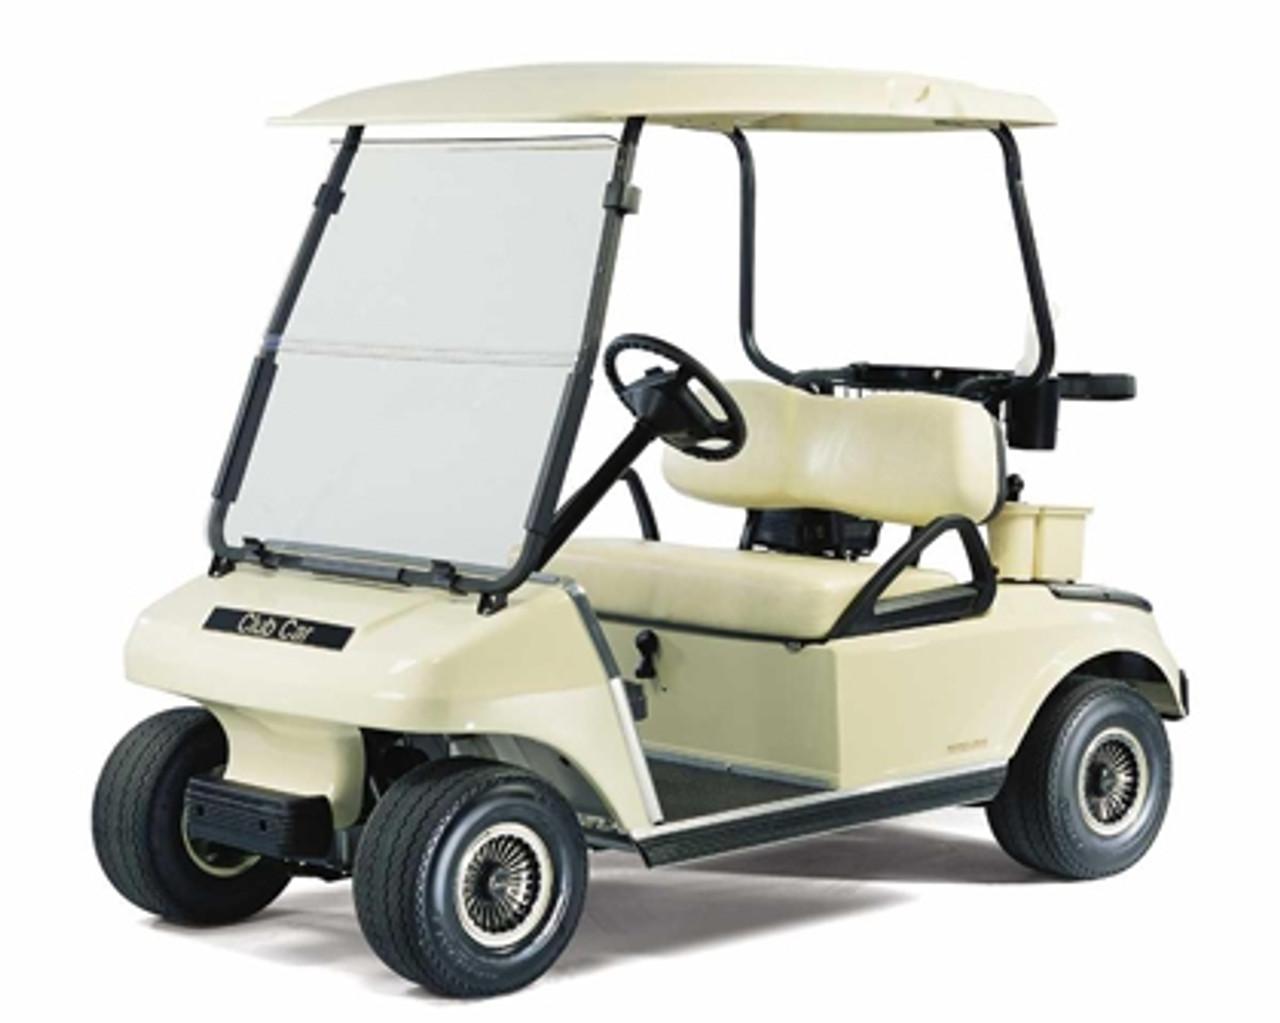 Golf Cart Floor Mats For Yamaha Club Car Ezgo Models